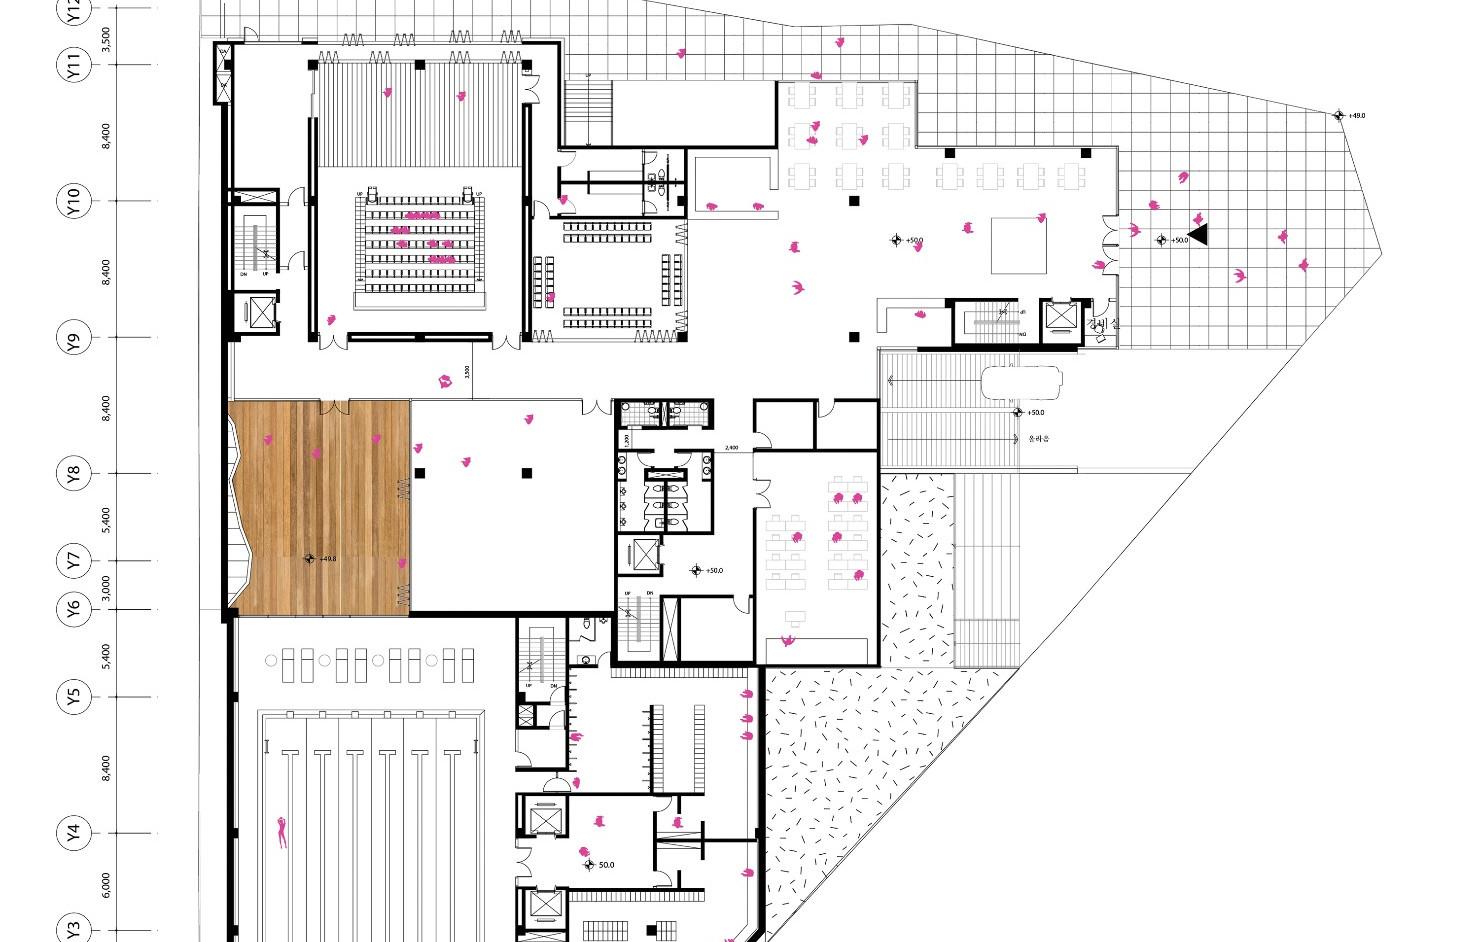 180406_floorplan_section-01 3_edited.jpg